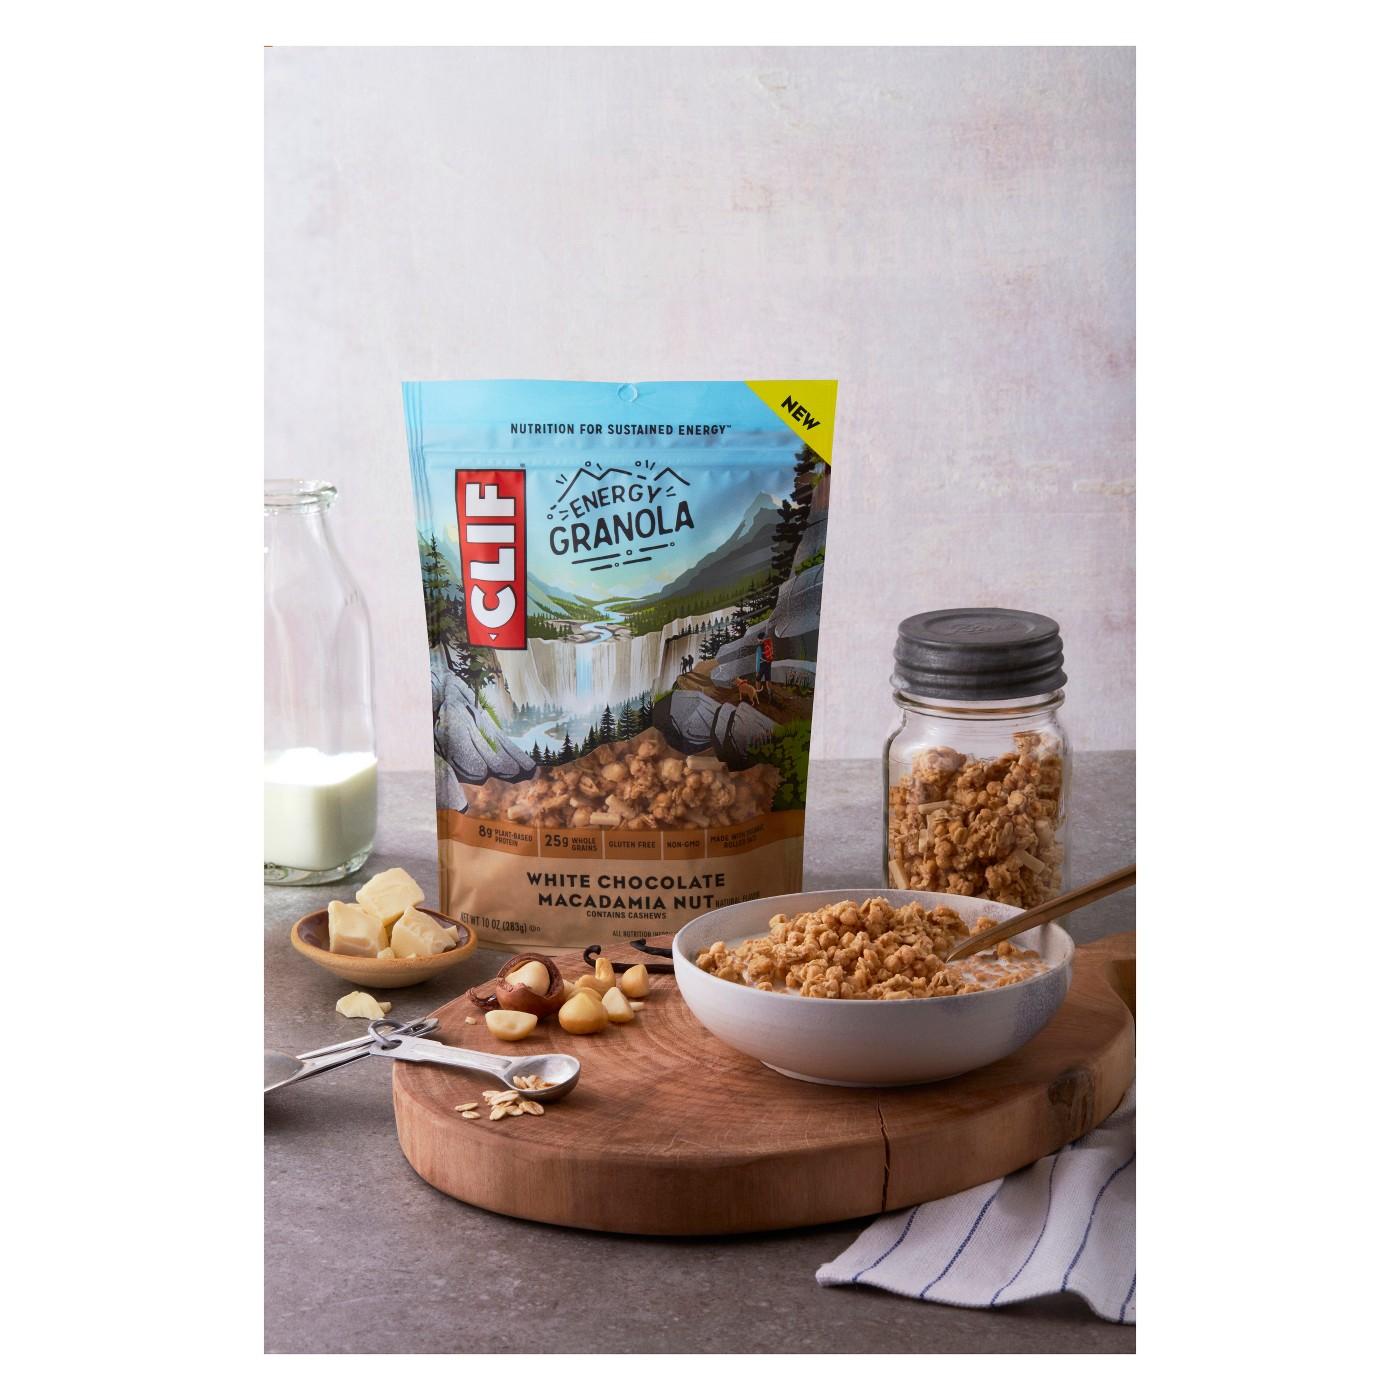 CLIF Energy White Chocolate Macadamia Nut Granola - 10oz - image 2 of 6